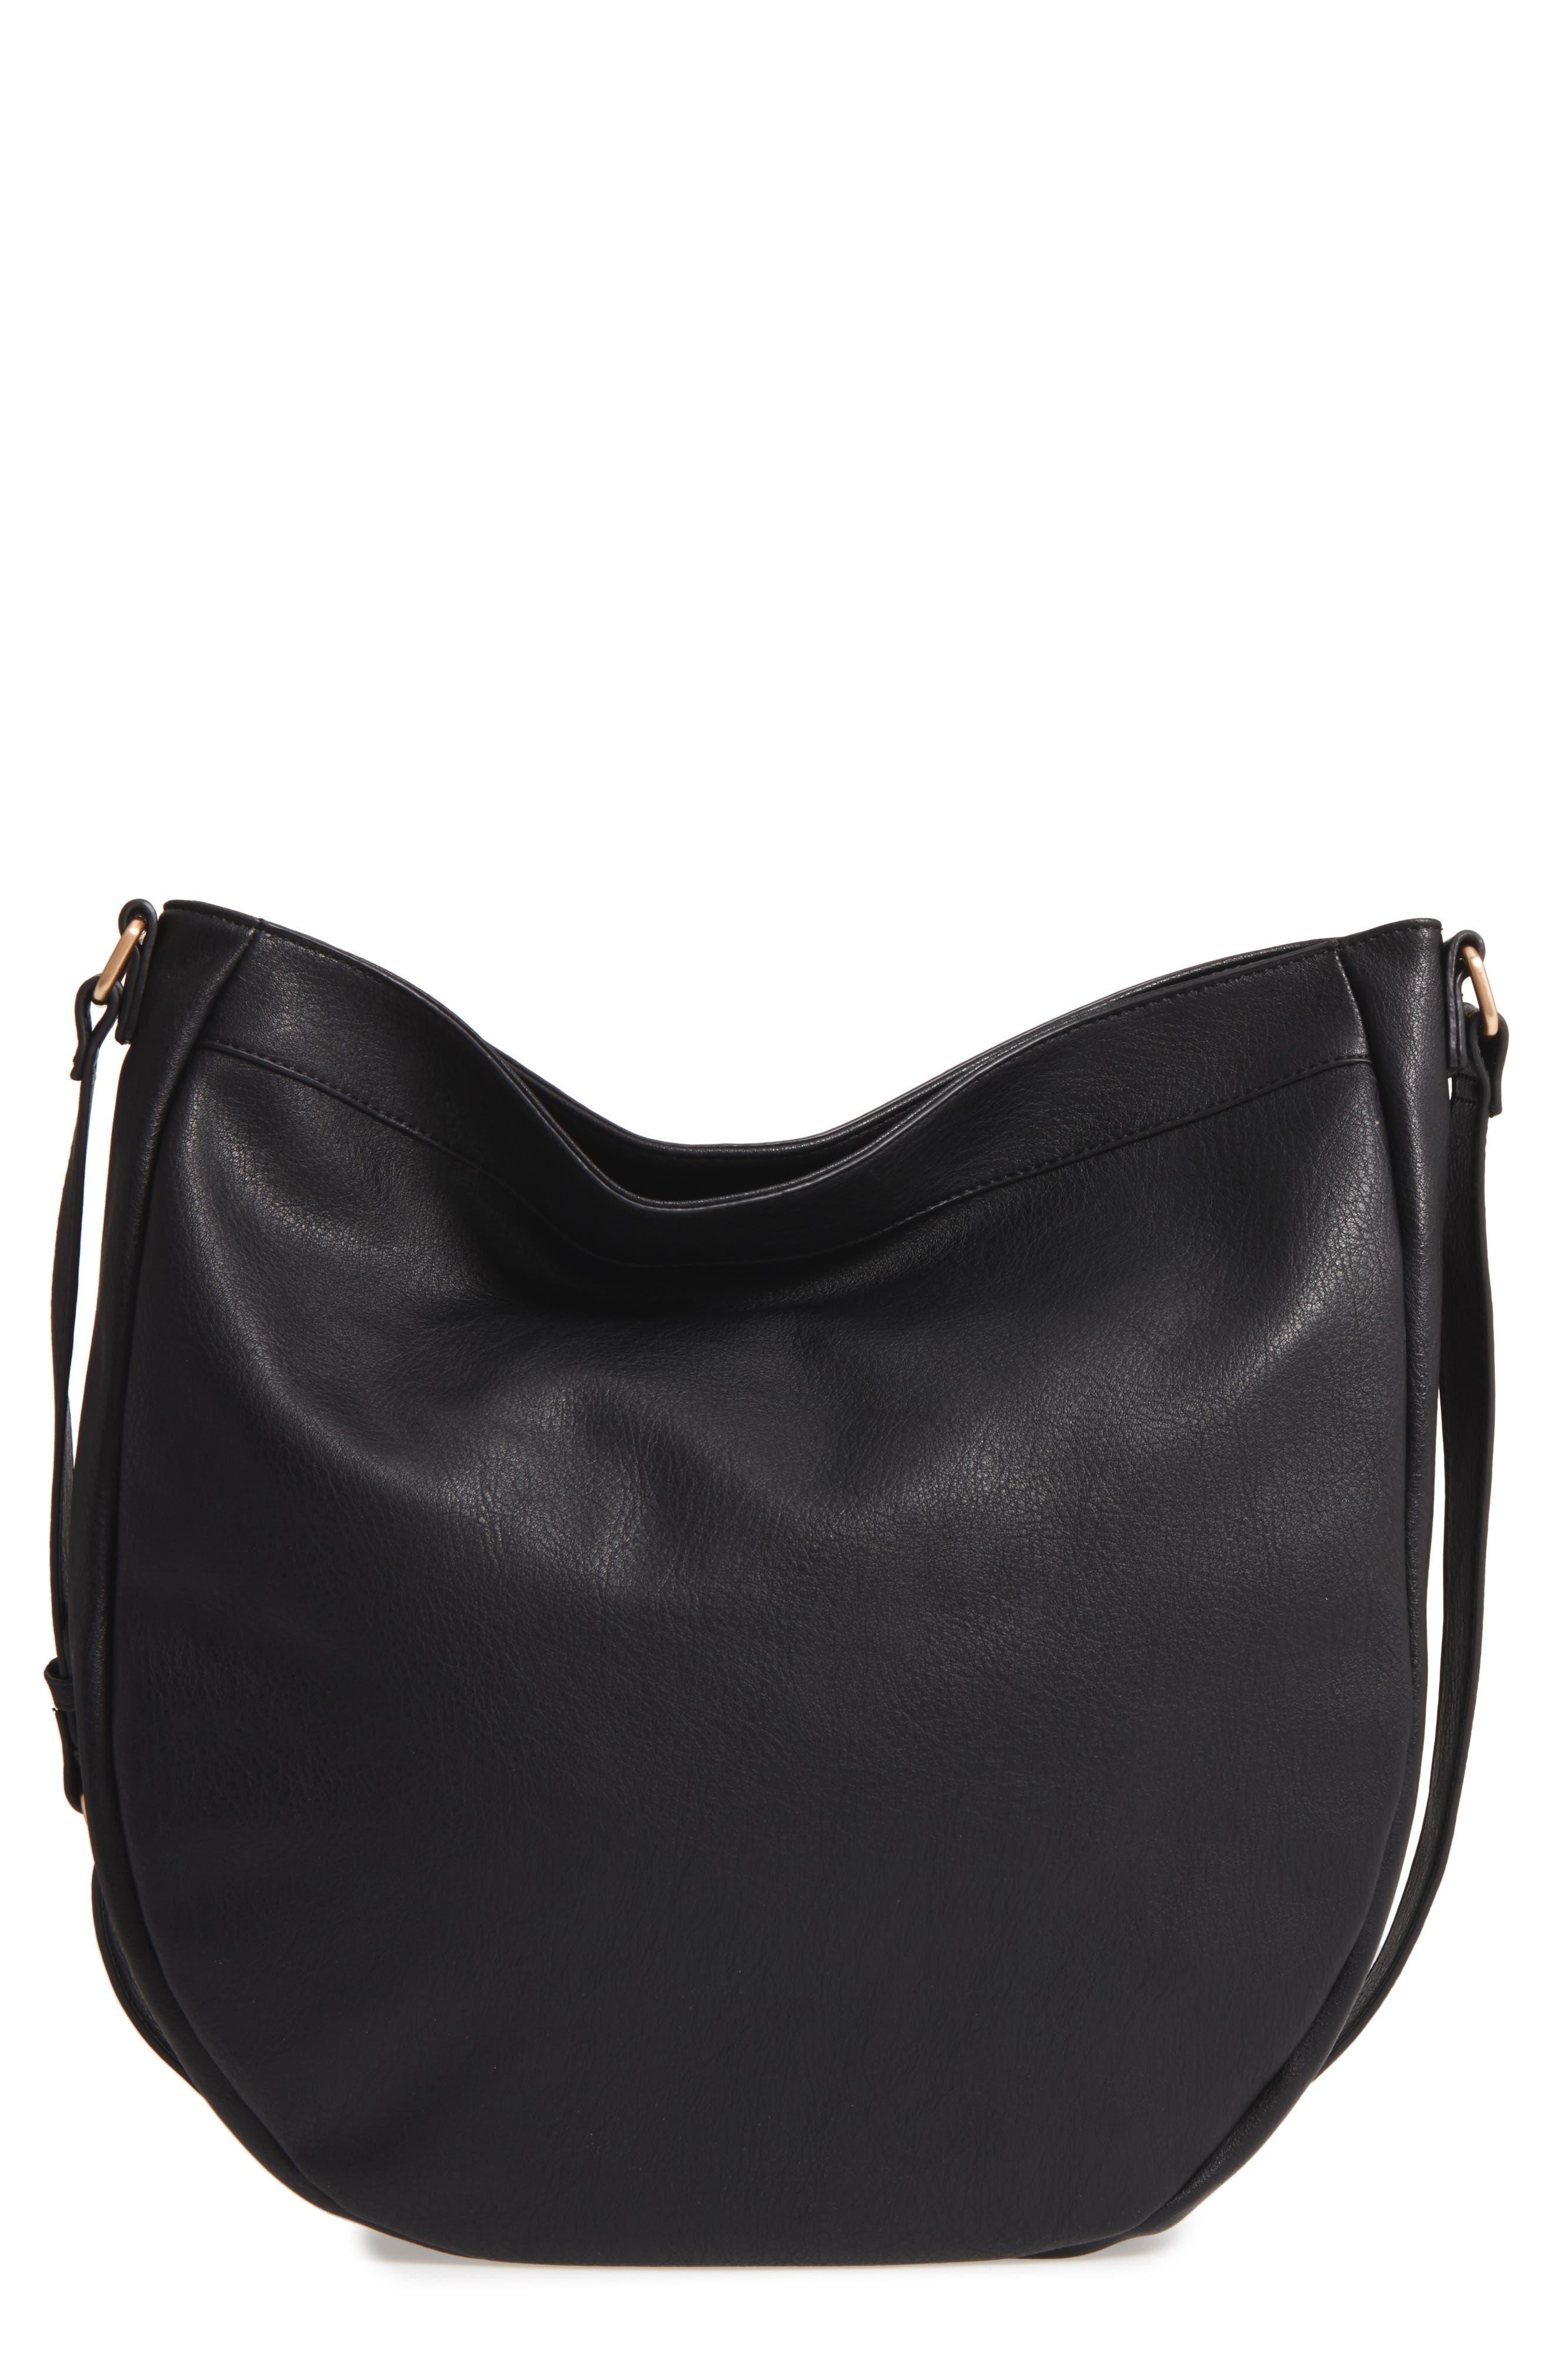 Kadence Faux Leather Shoulder Bag,                             Main thumbnail 1, color,